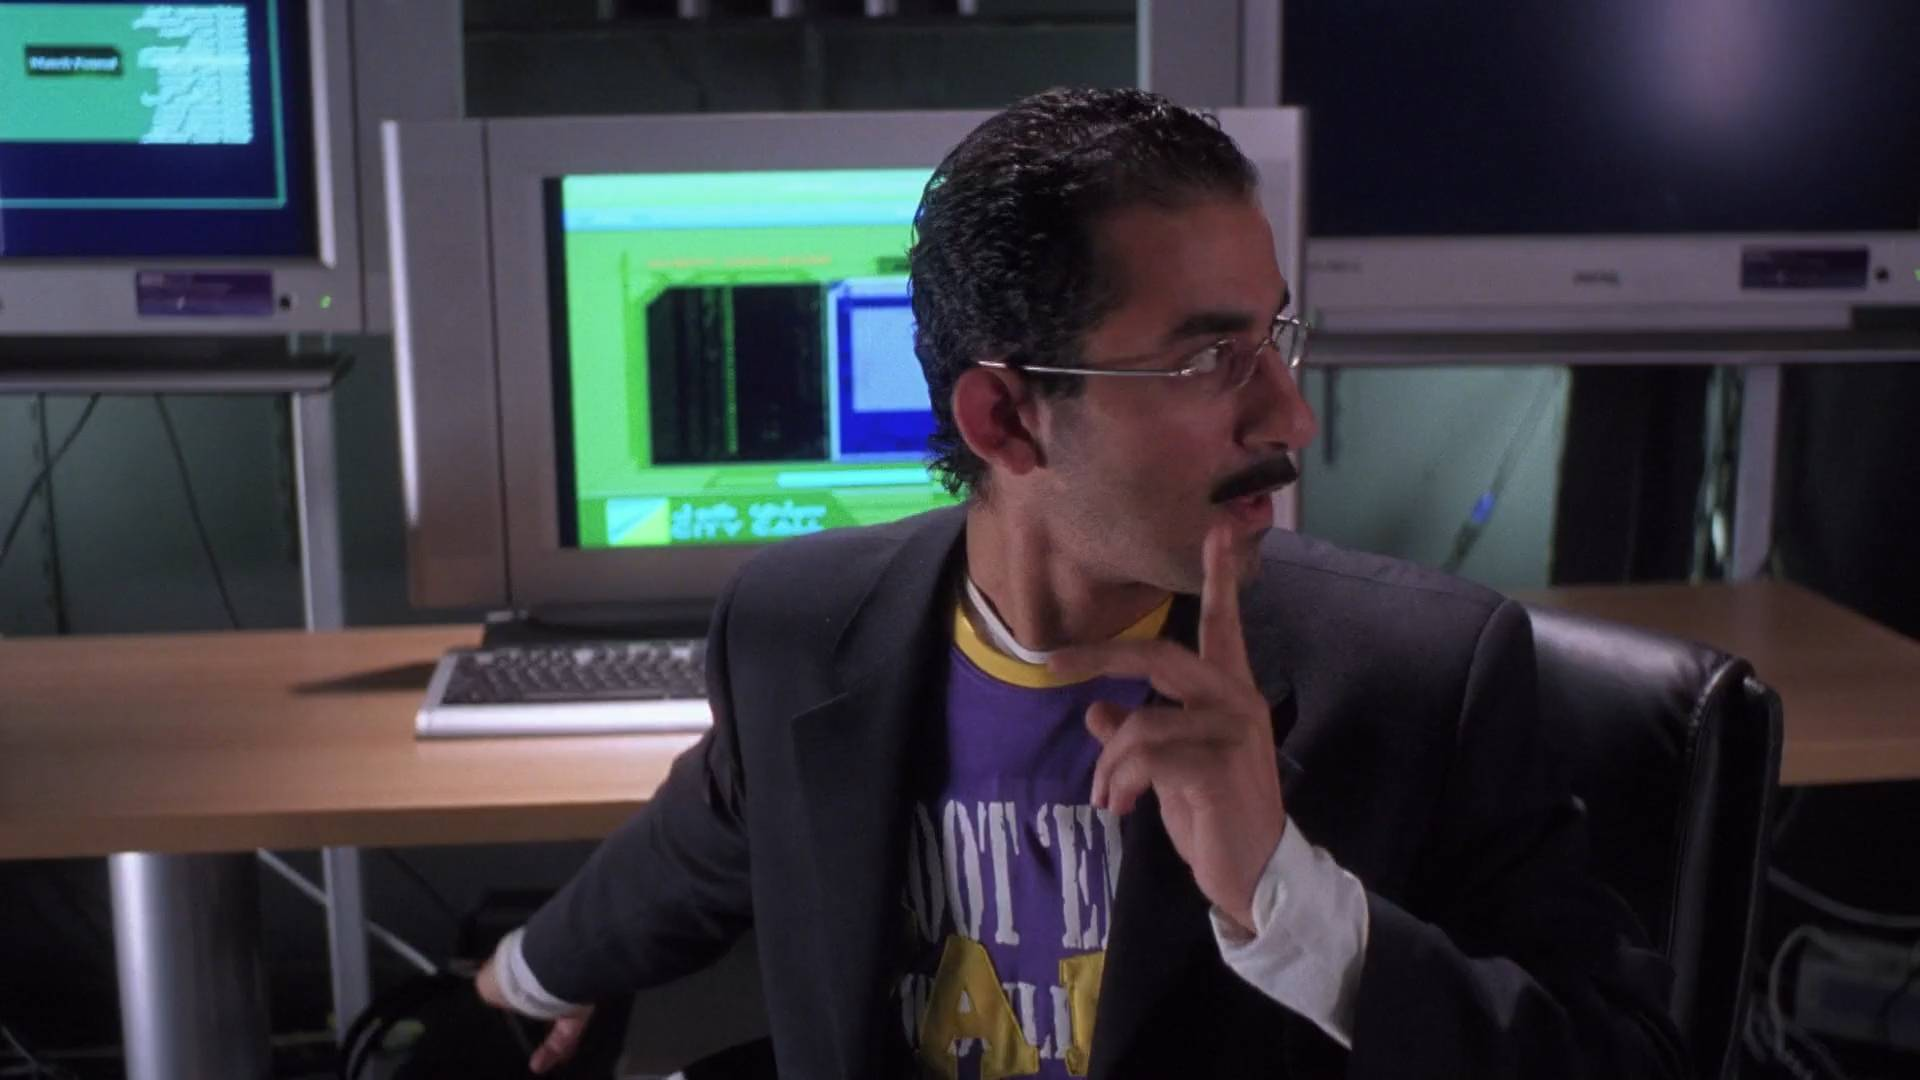 [فيلم][تورنت][تحميل][ظرف طارق][2006][1080p][Web-DL] 5 arabp2p.com